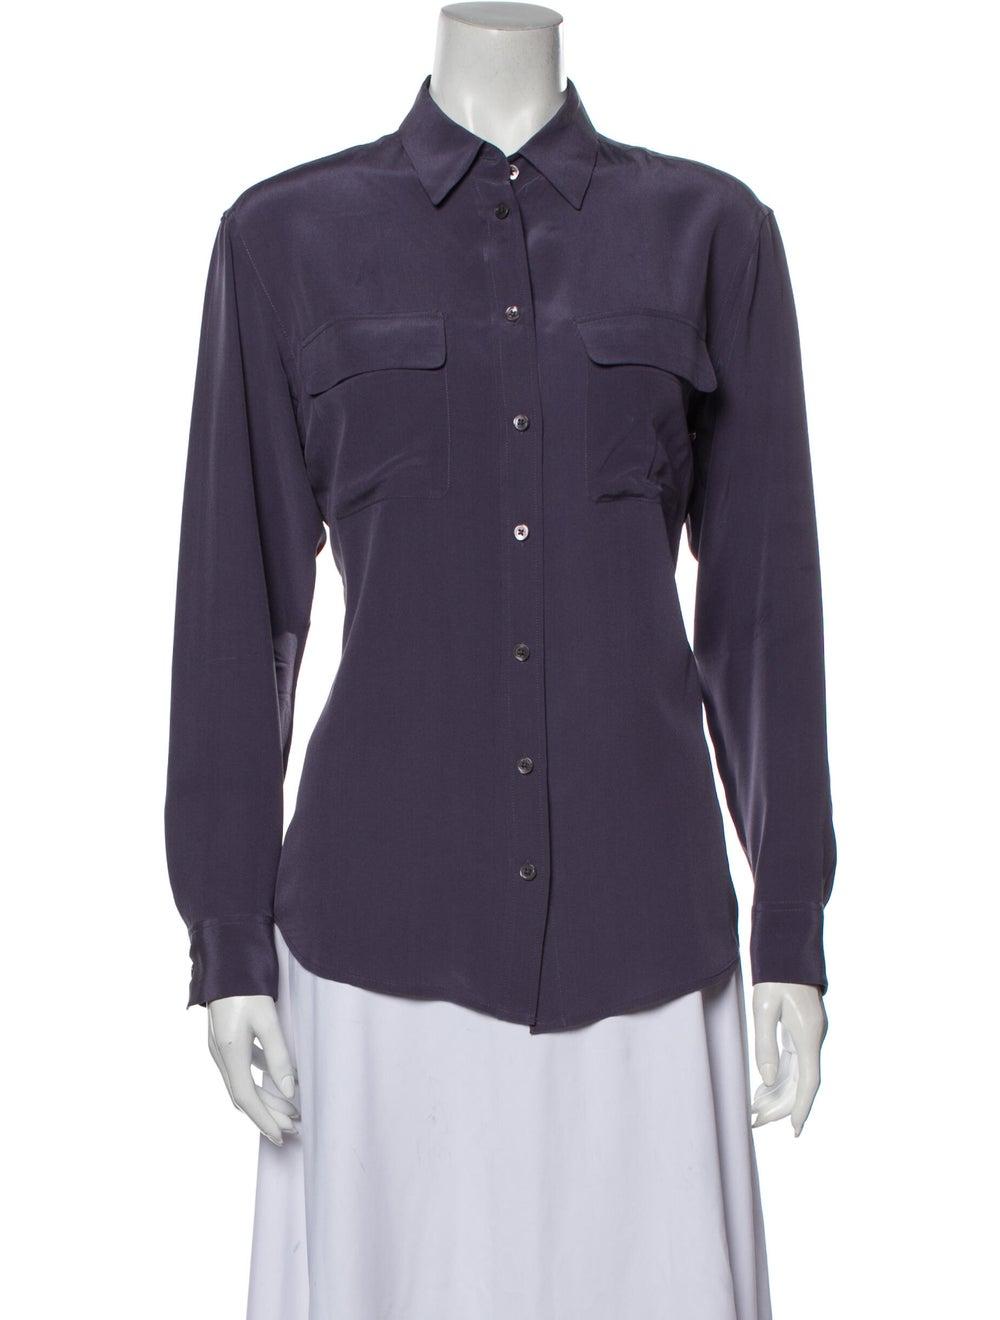 Equipment Silk Long Sleeve Button-Up Top Purple - image 1